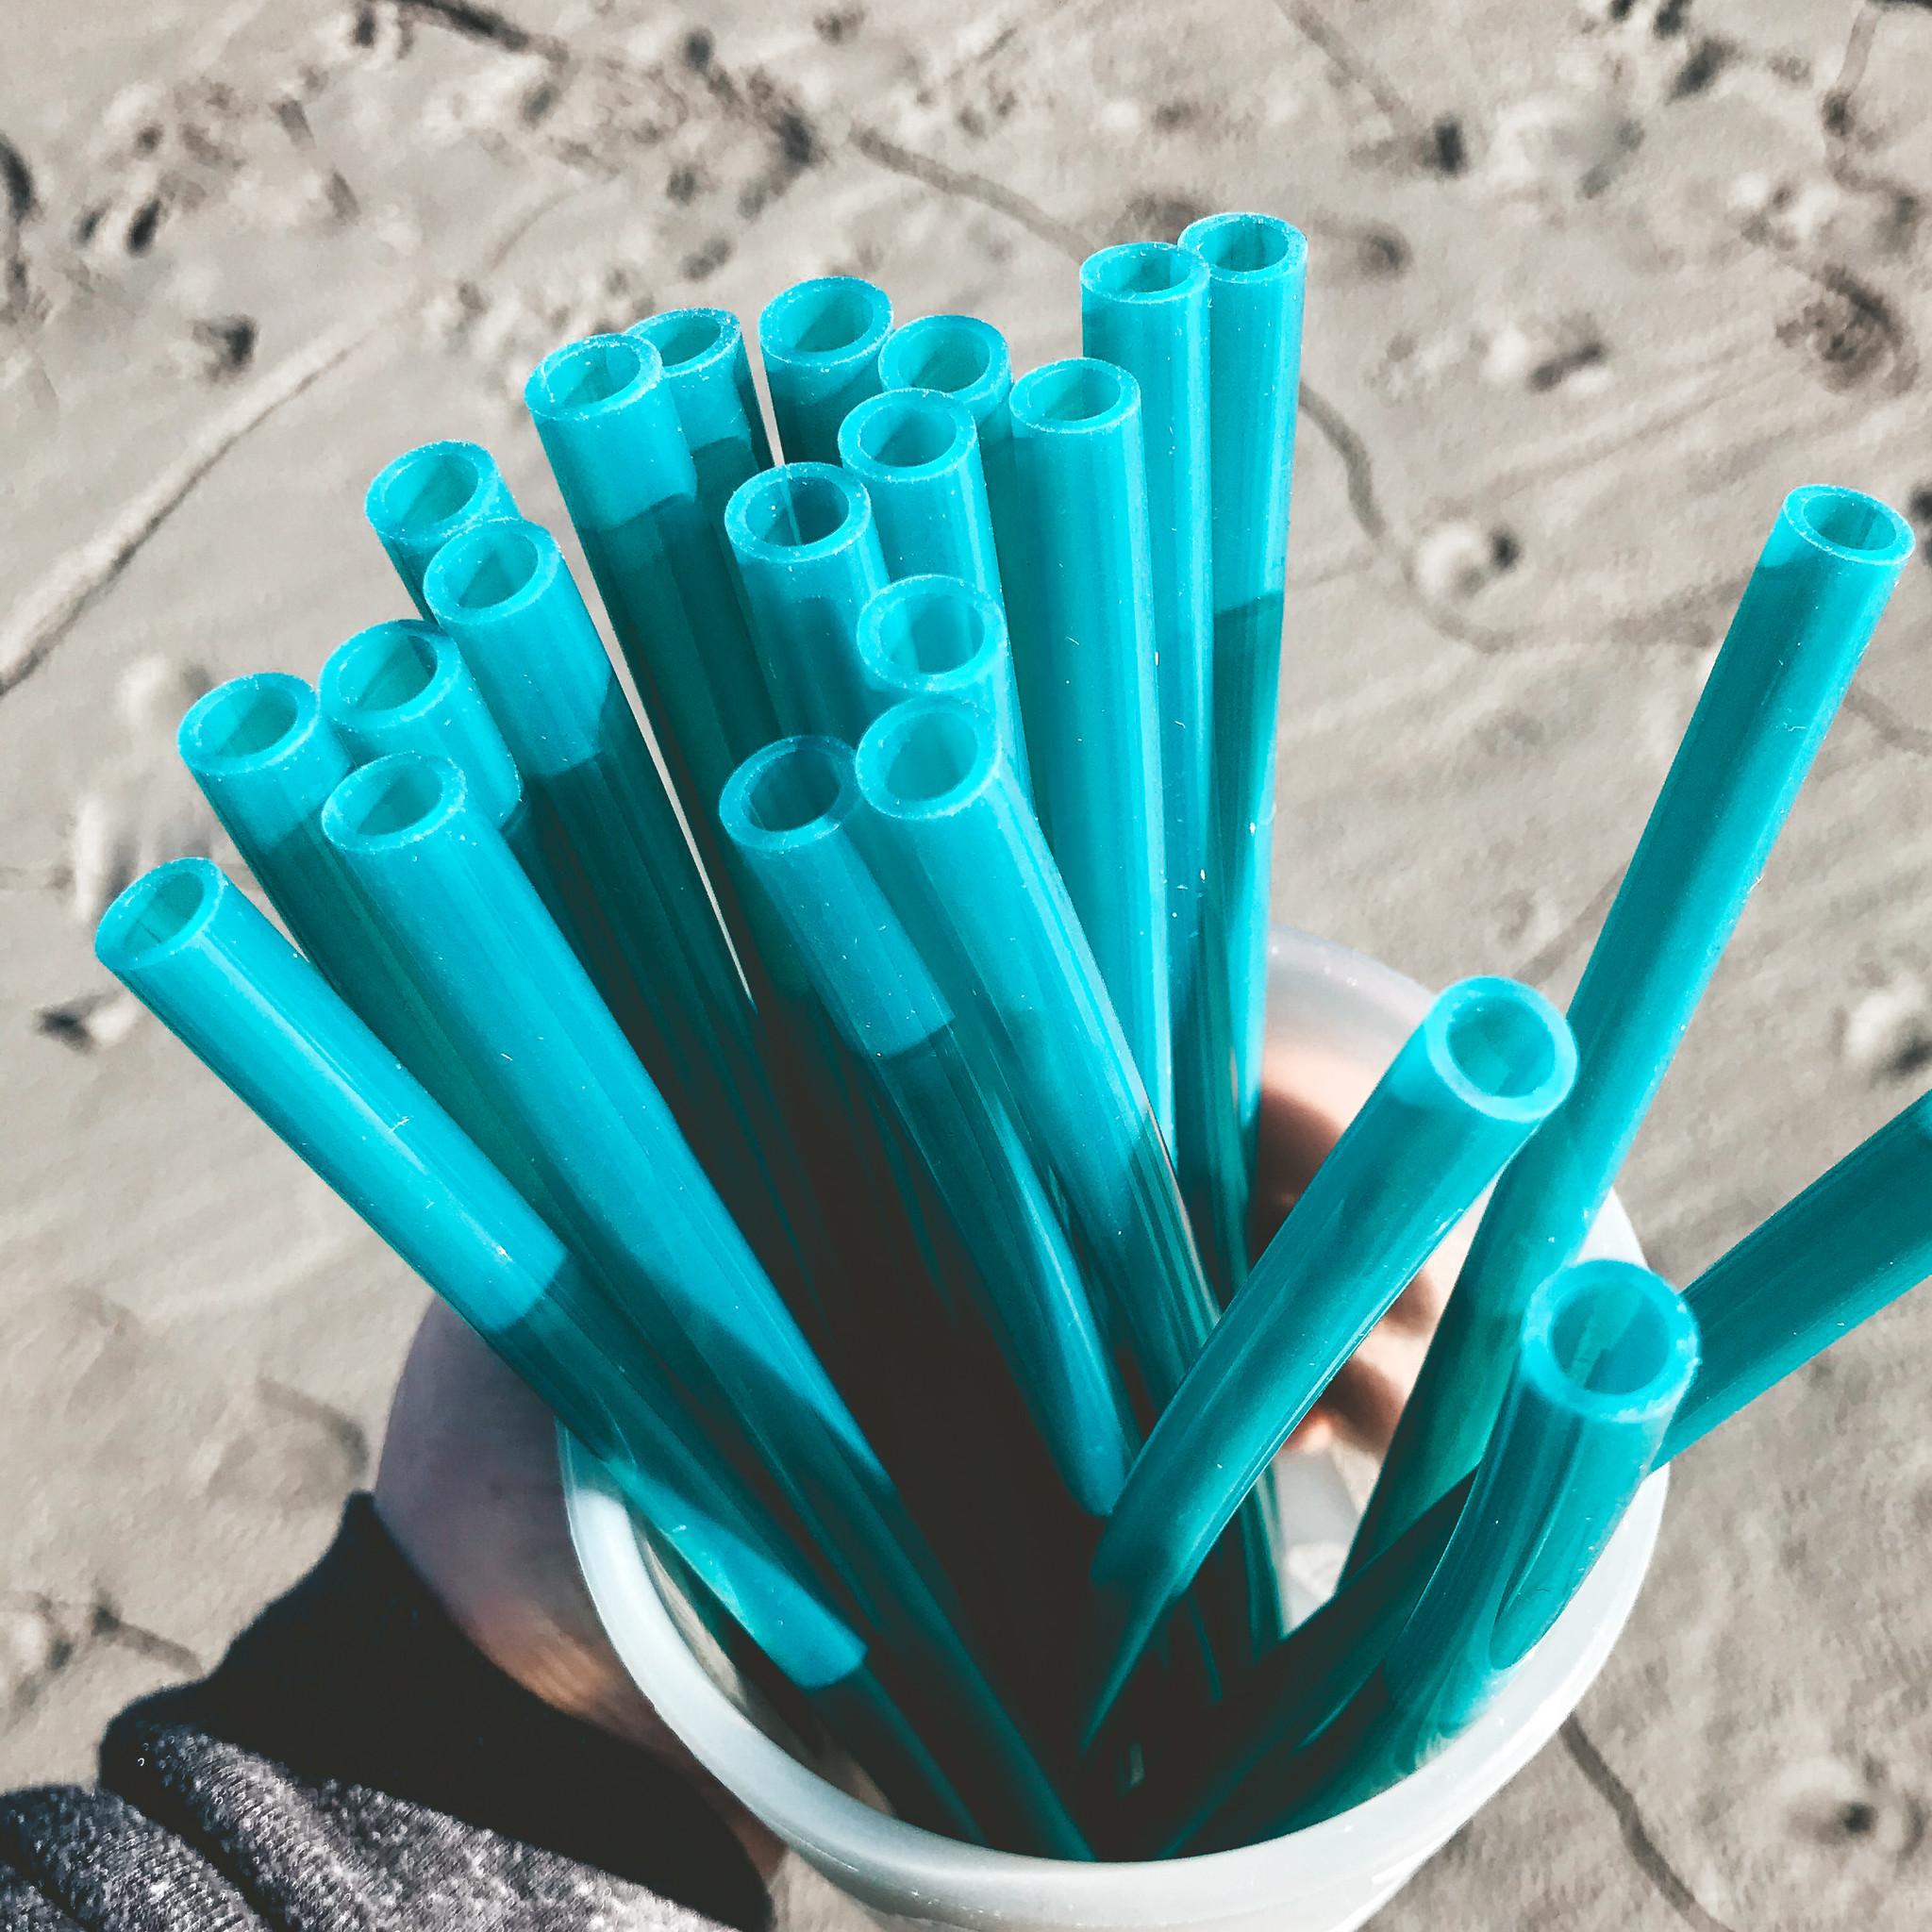 Straw- Reef